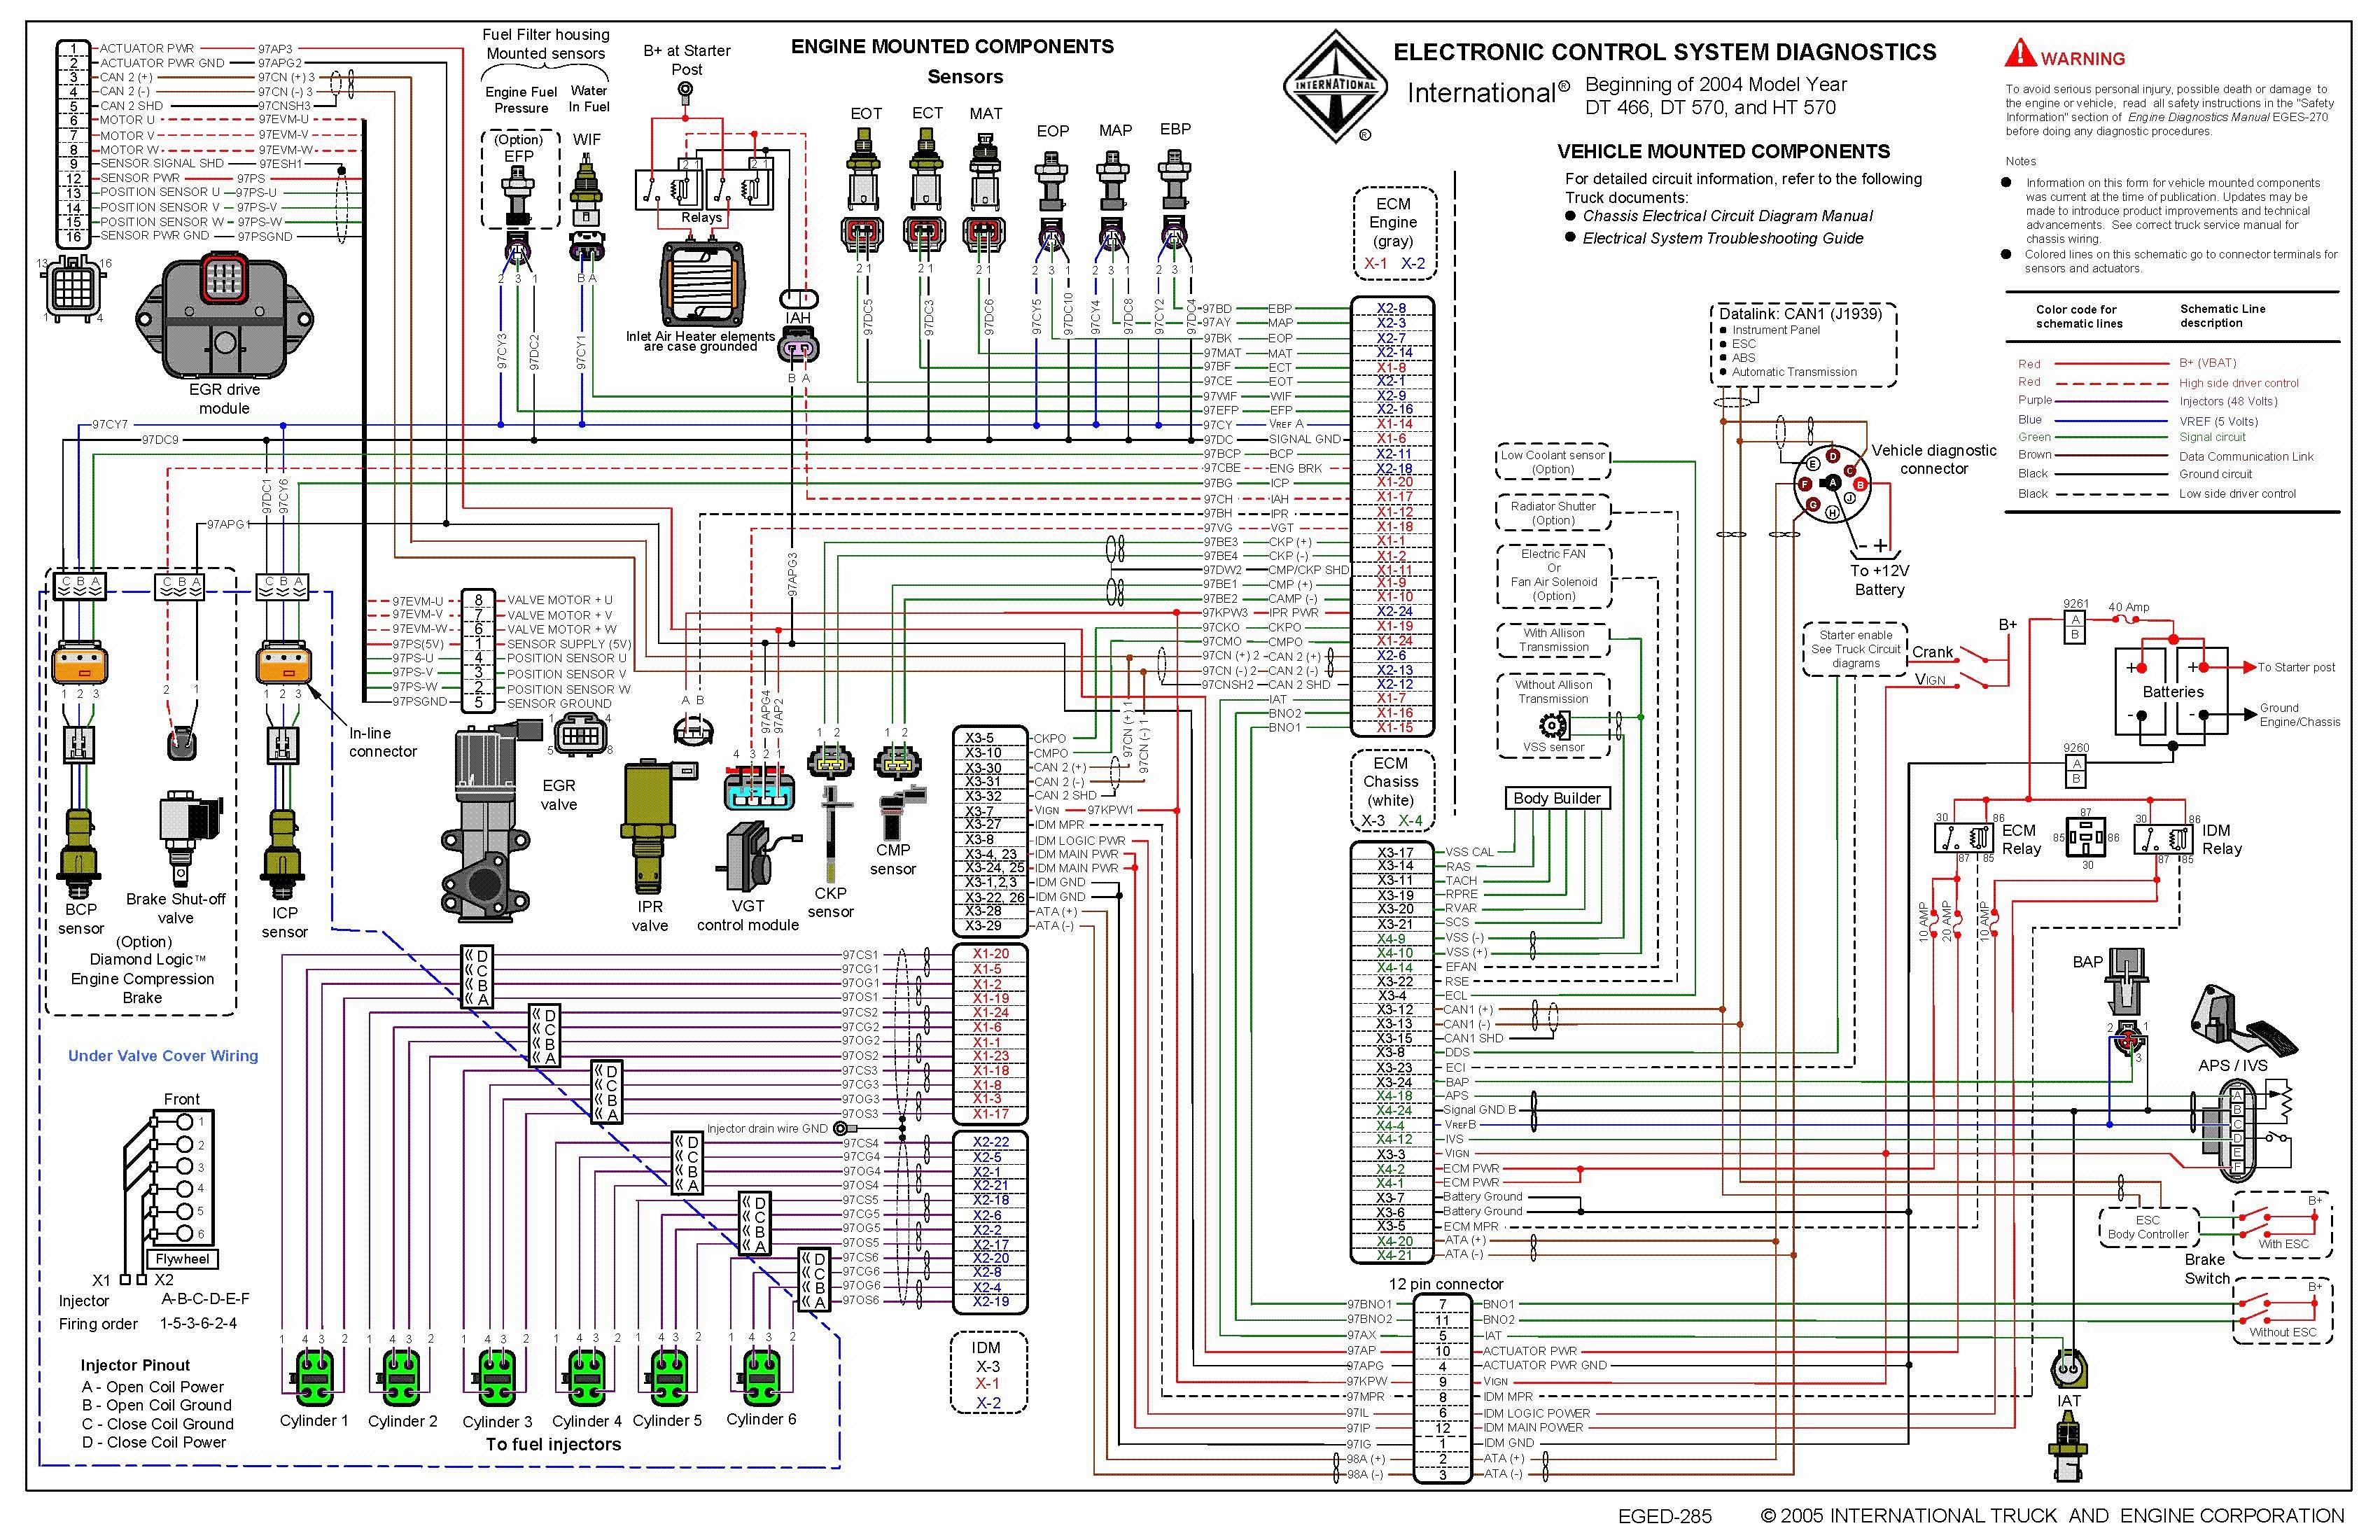 9200 international ac wiring diagram auto electrical wiring diagram u2022 rh 6weeks co uk